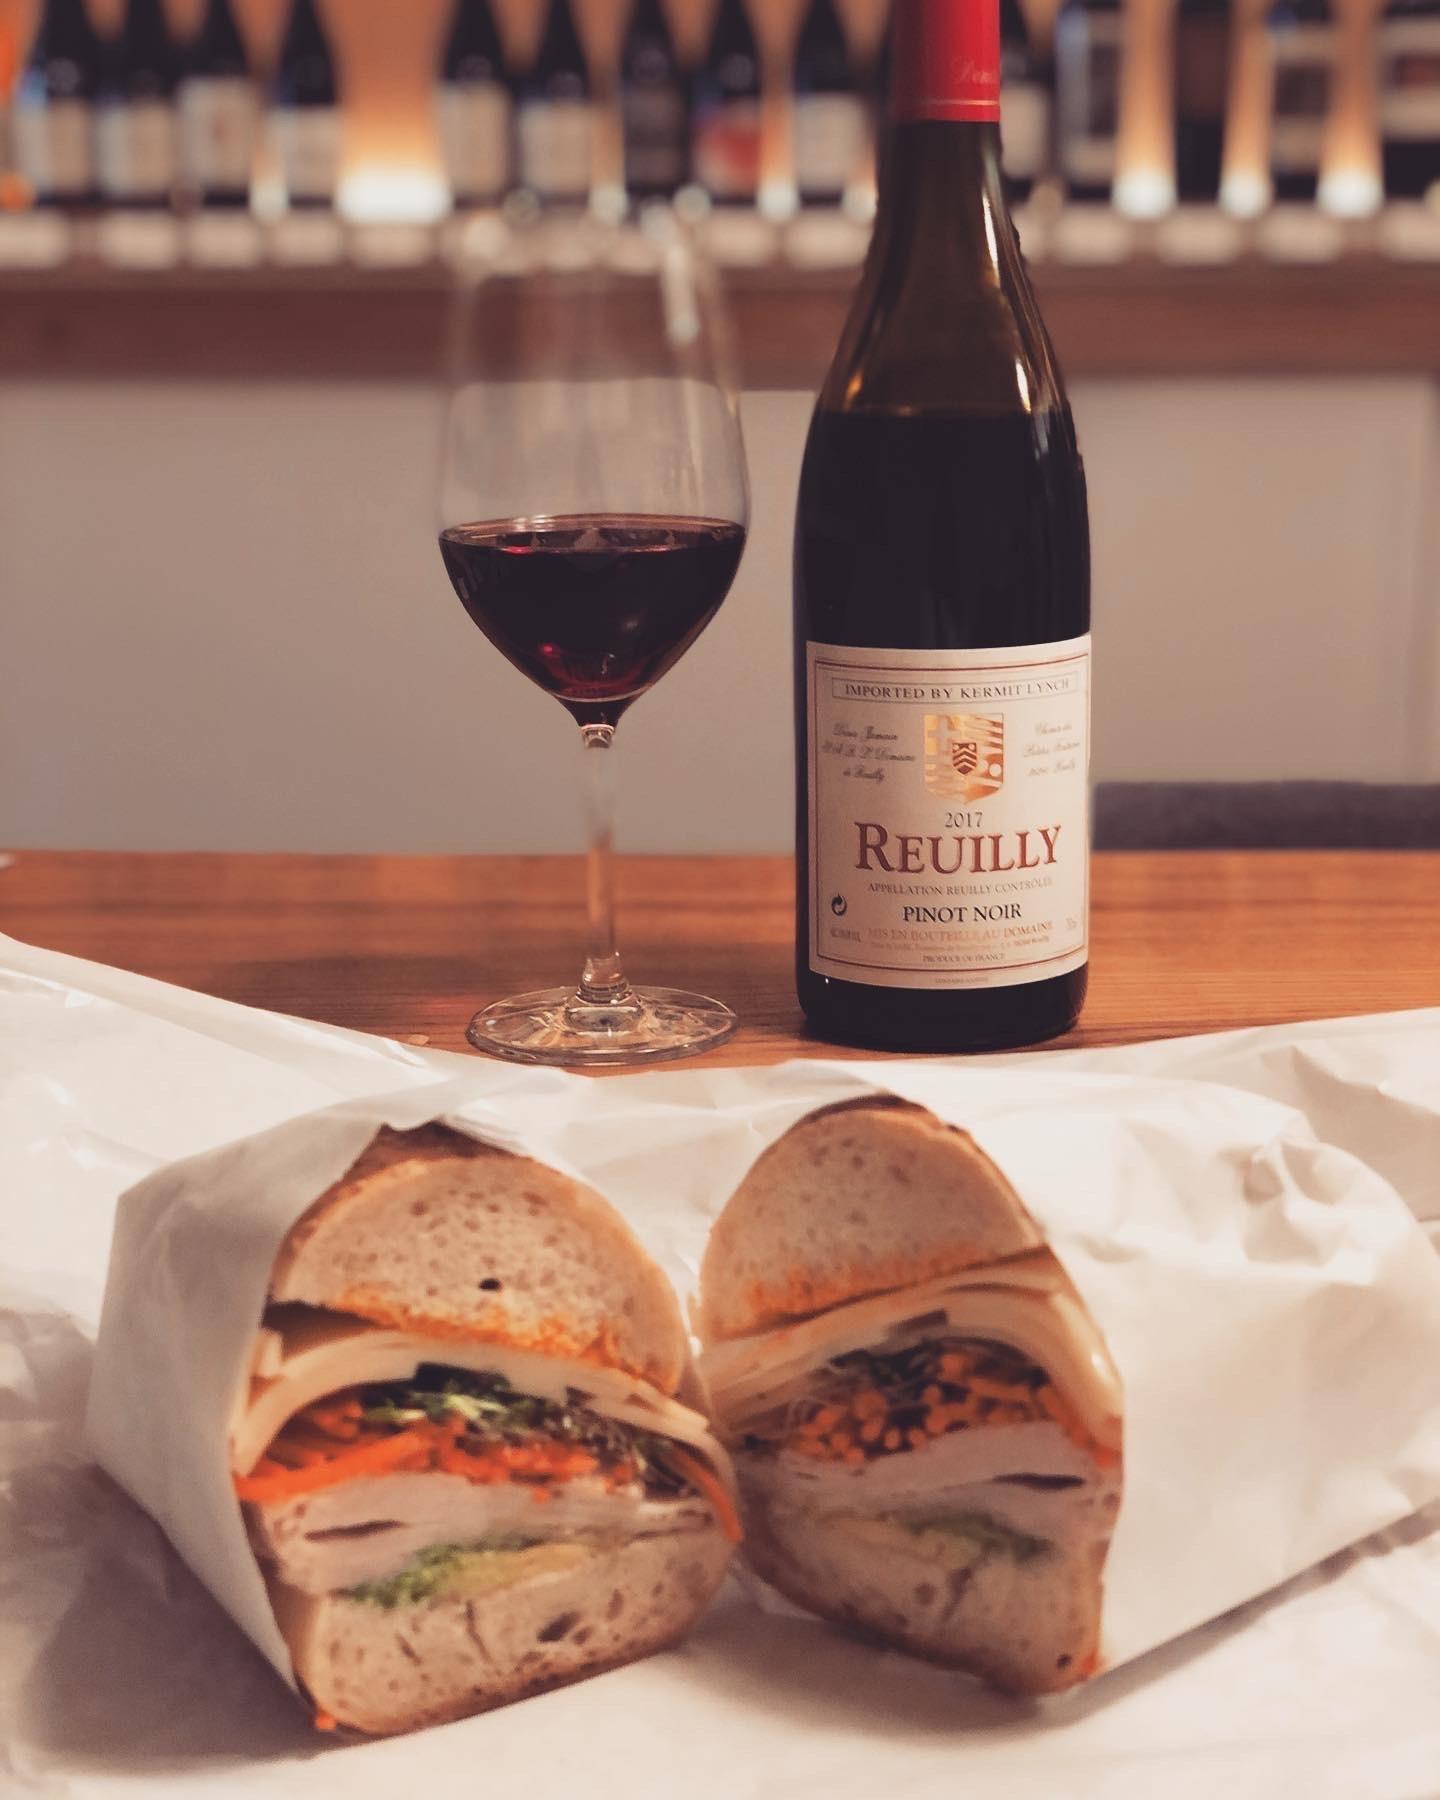 Tiny's Giant Sandwich + Reuilly Pinot Noir